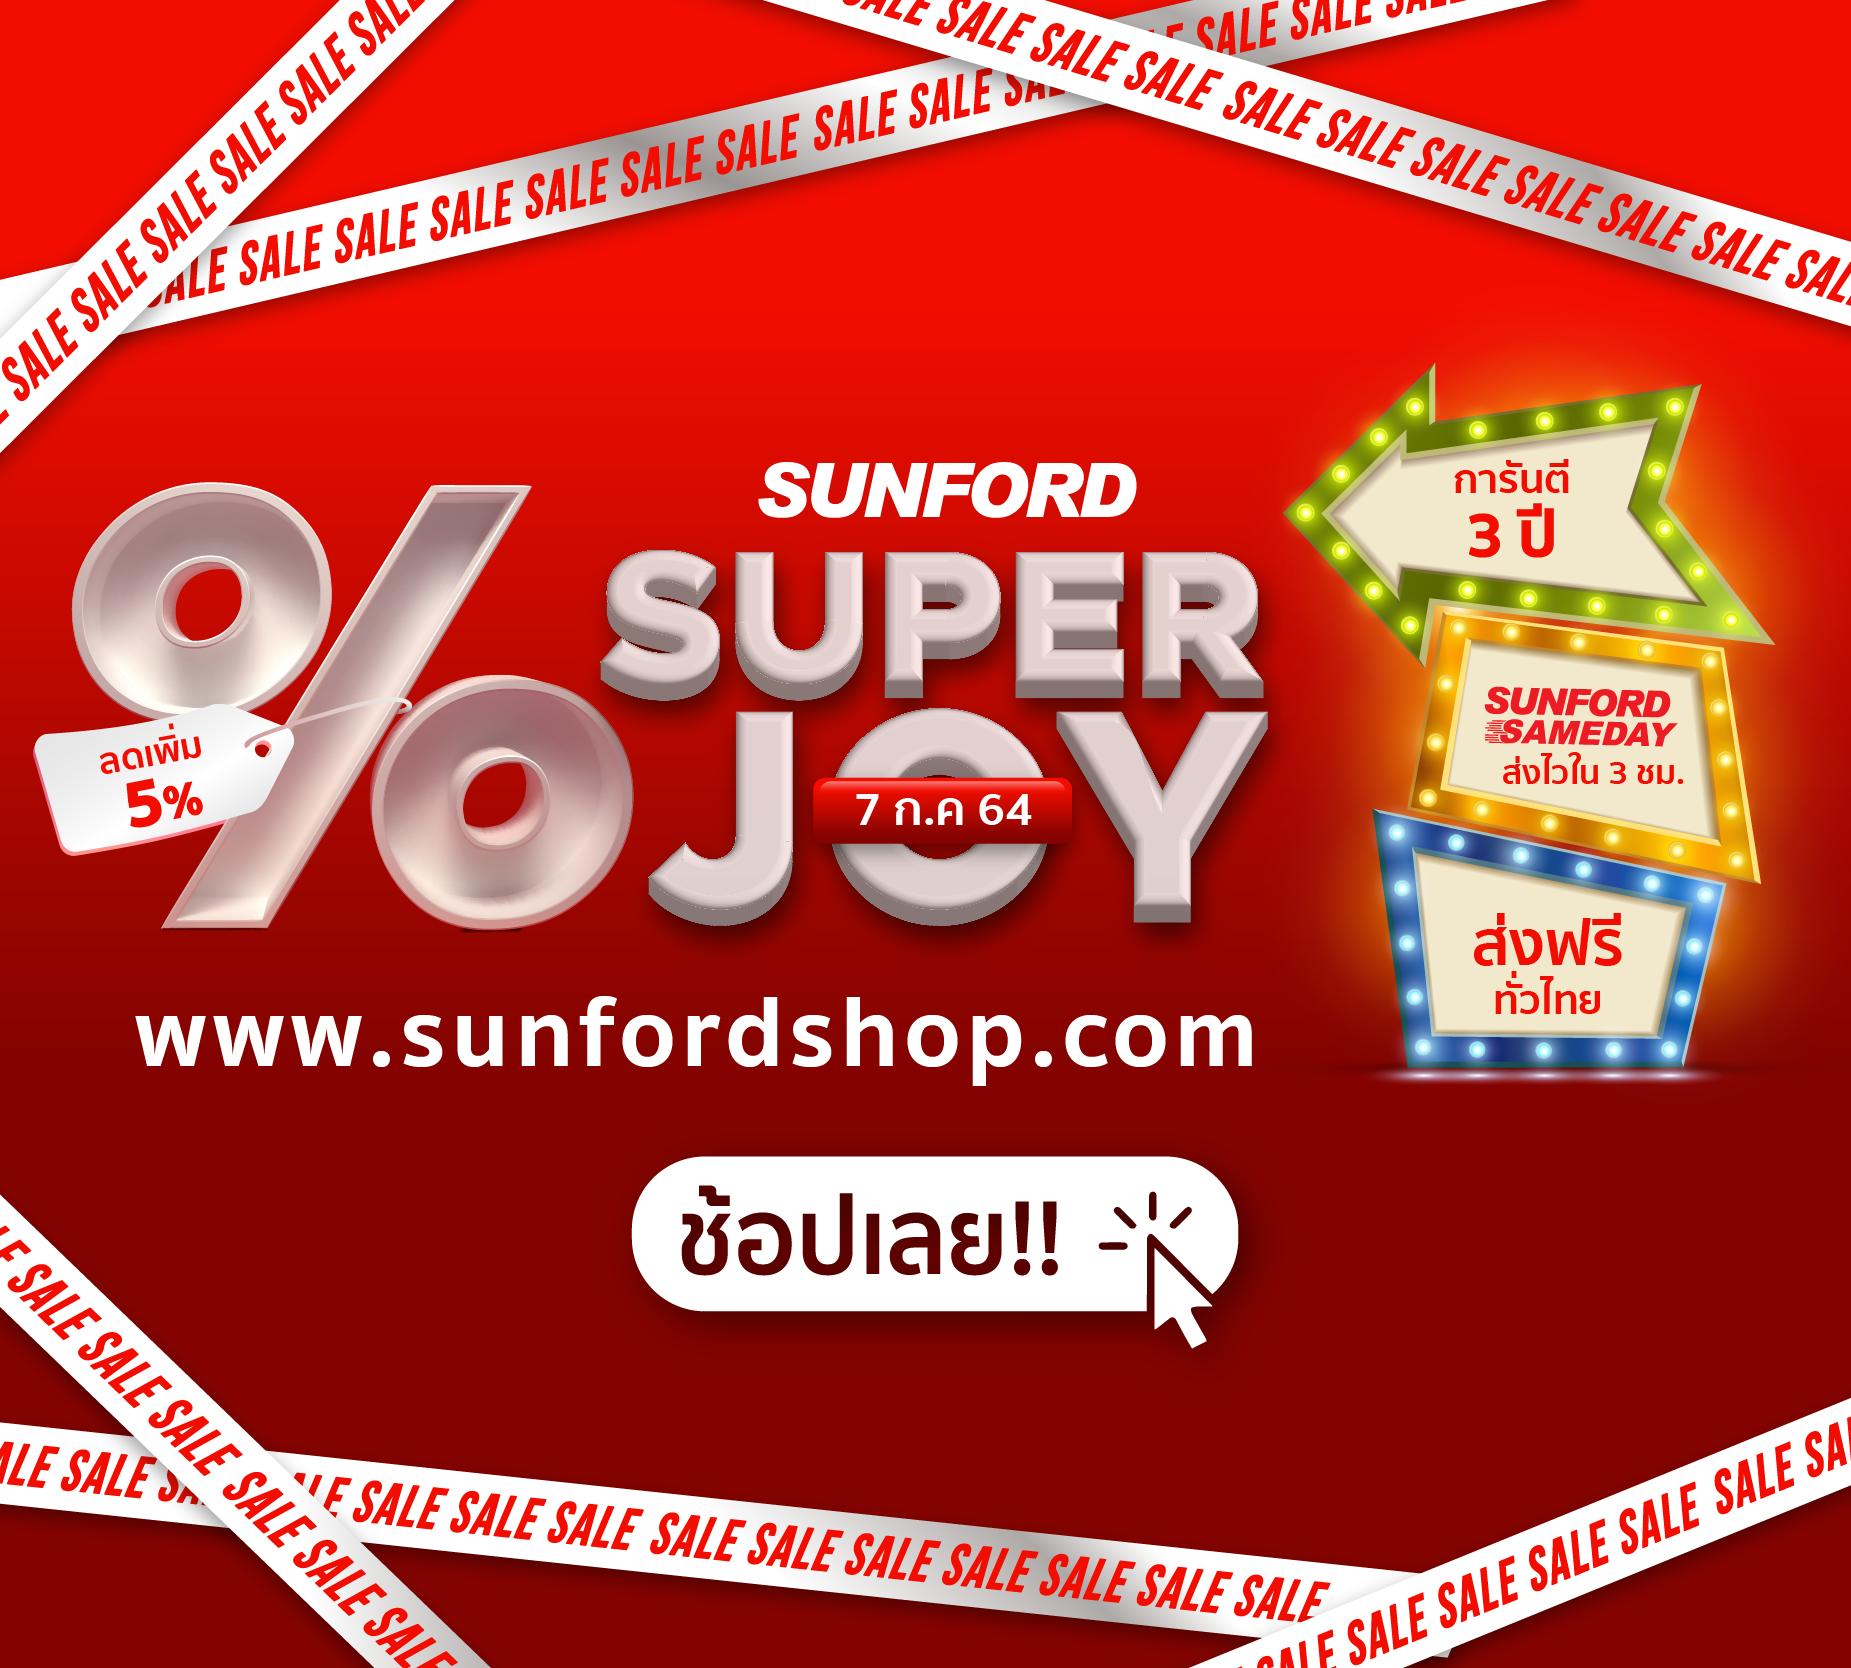 SUNFORD 7.7 SUPER JOY